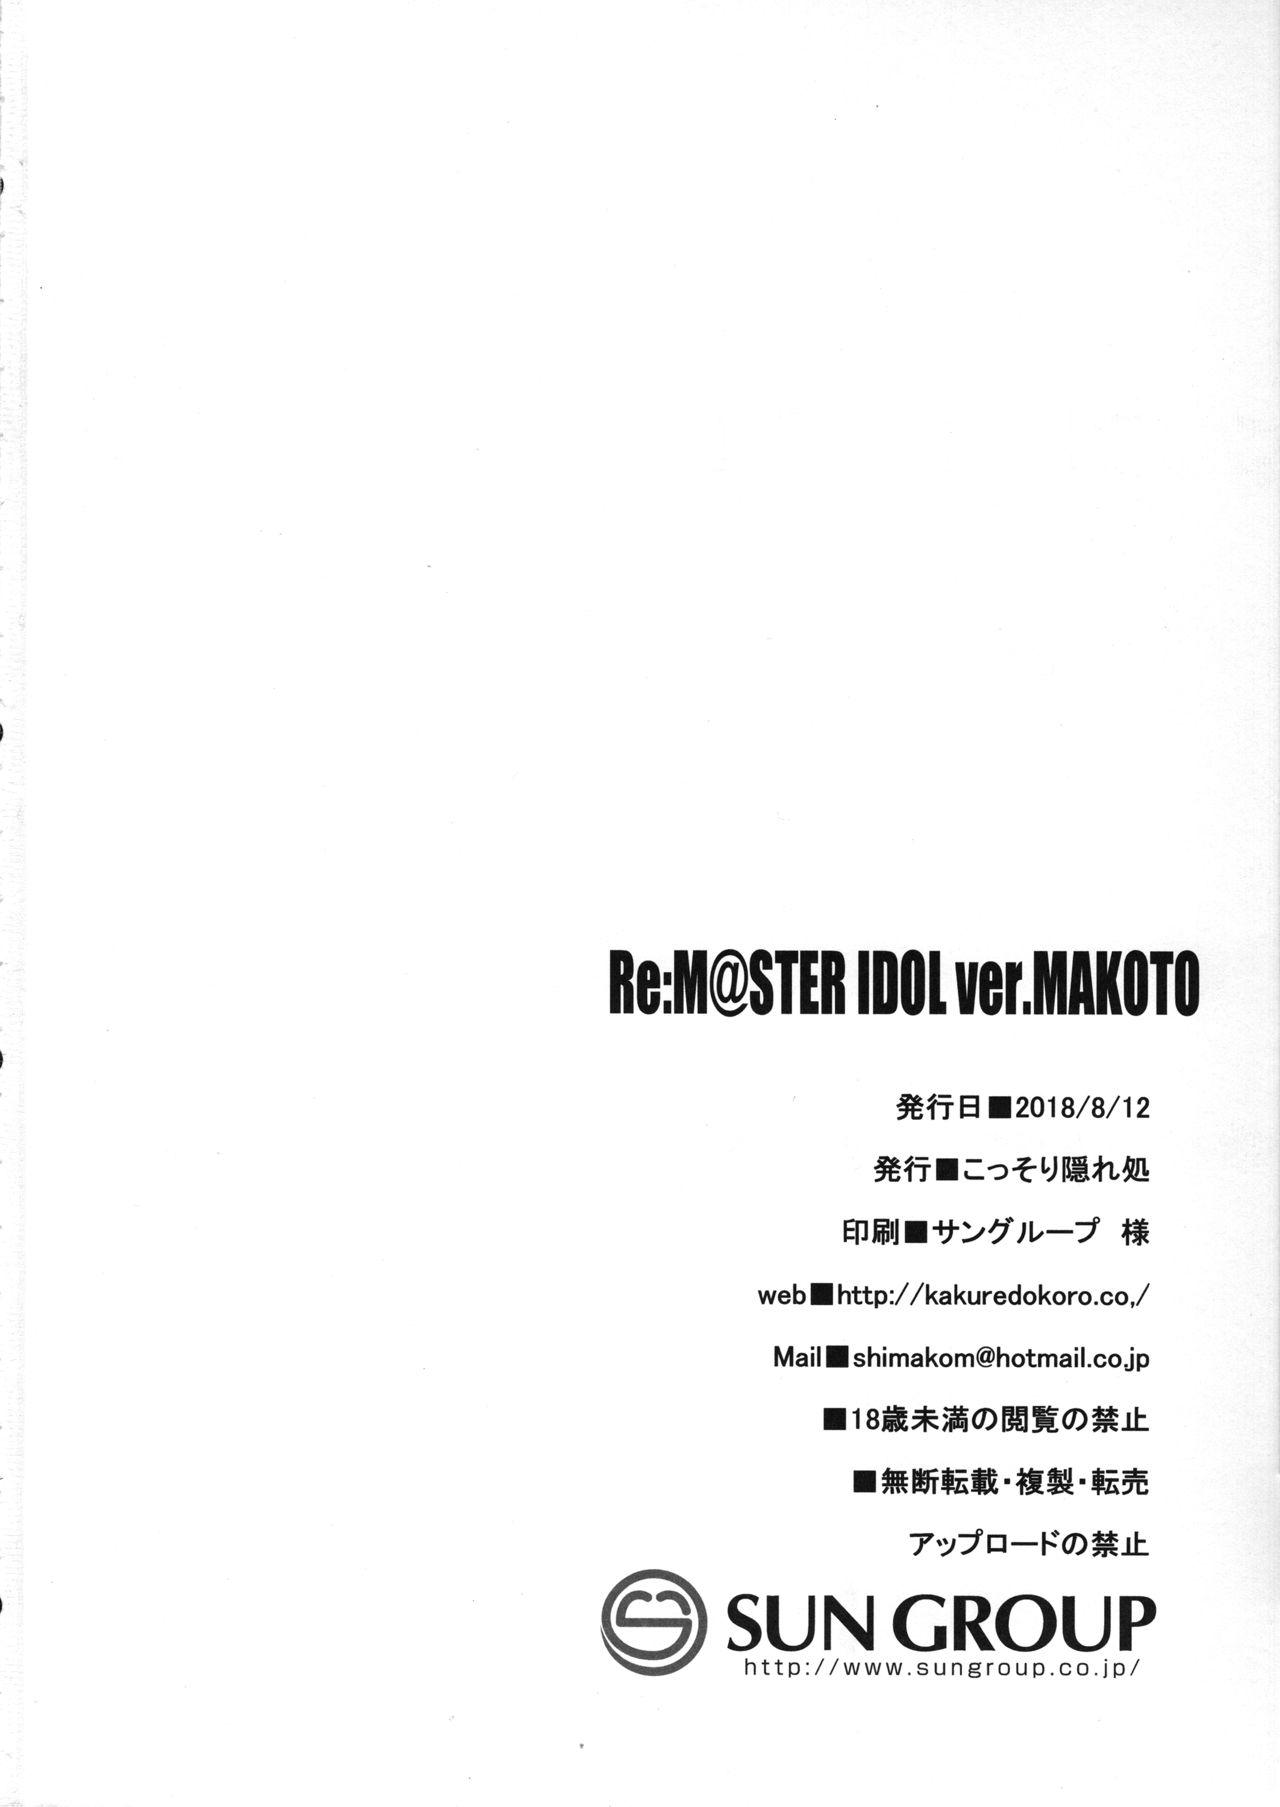 Re:M@STER IDOL ver.MAKOTO 20